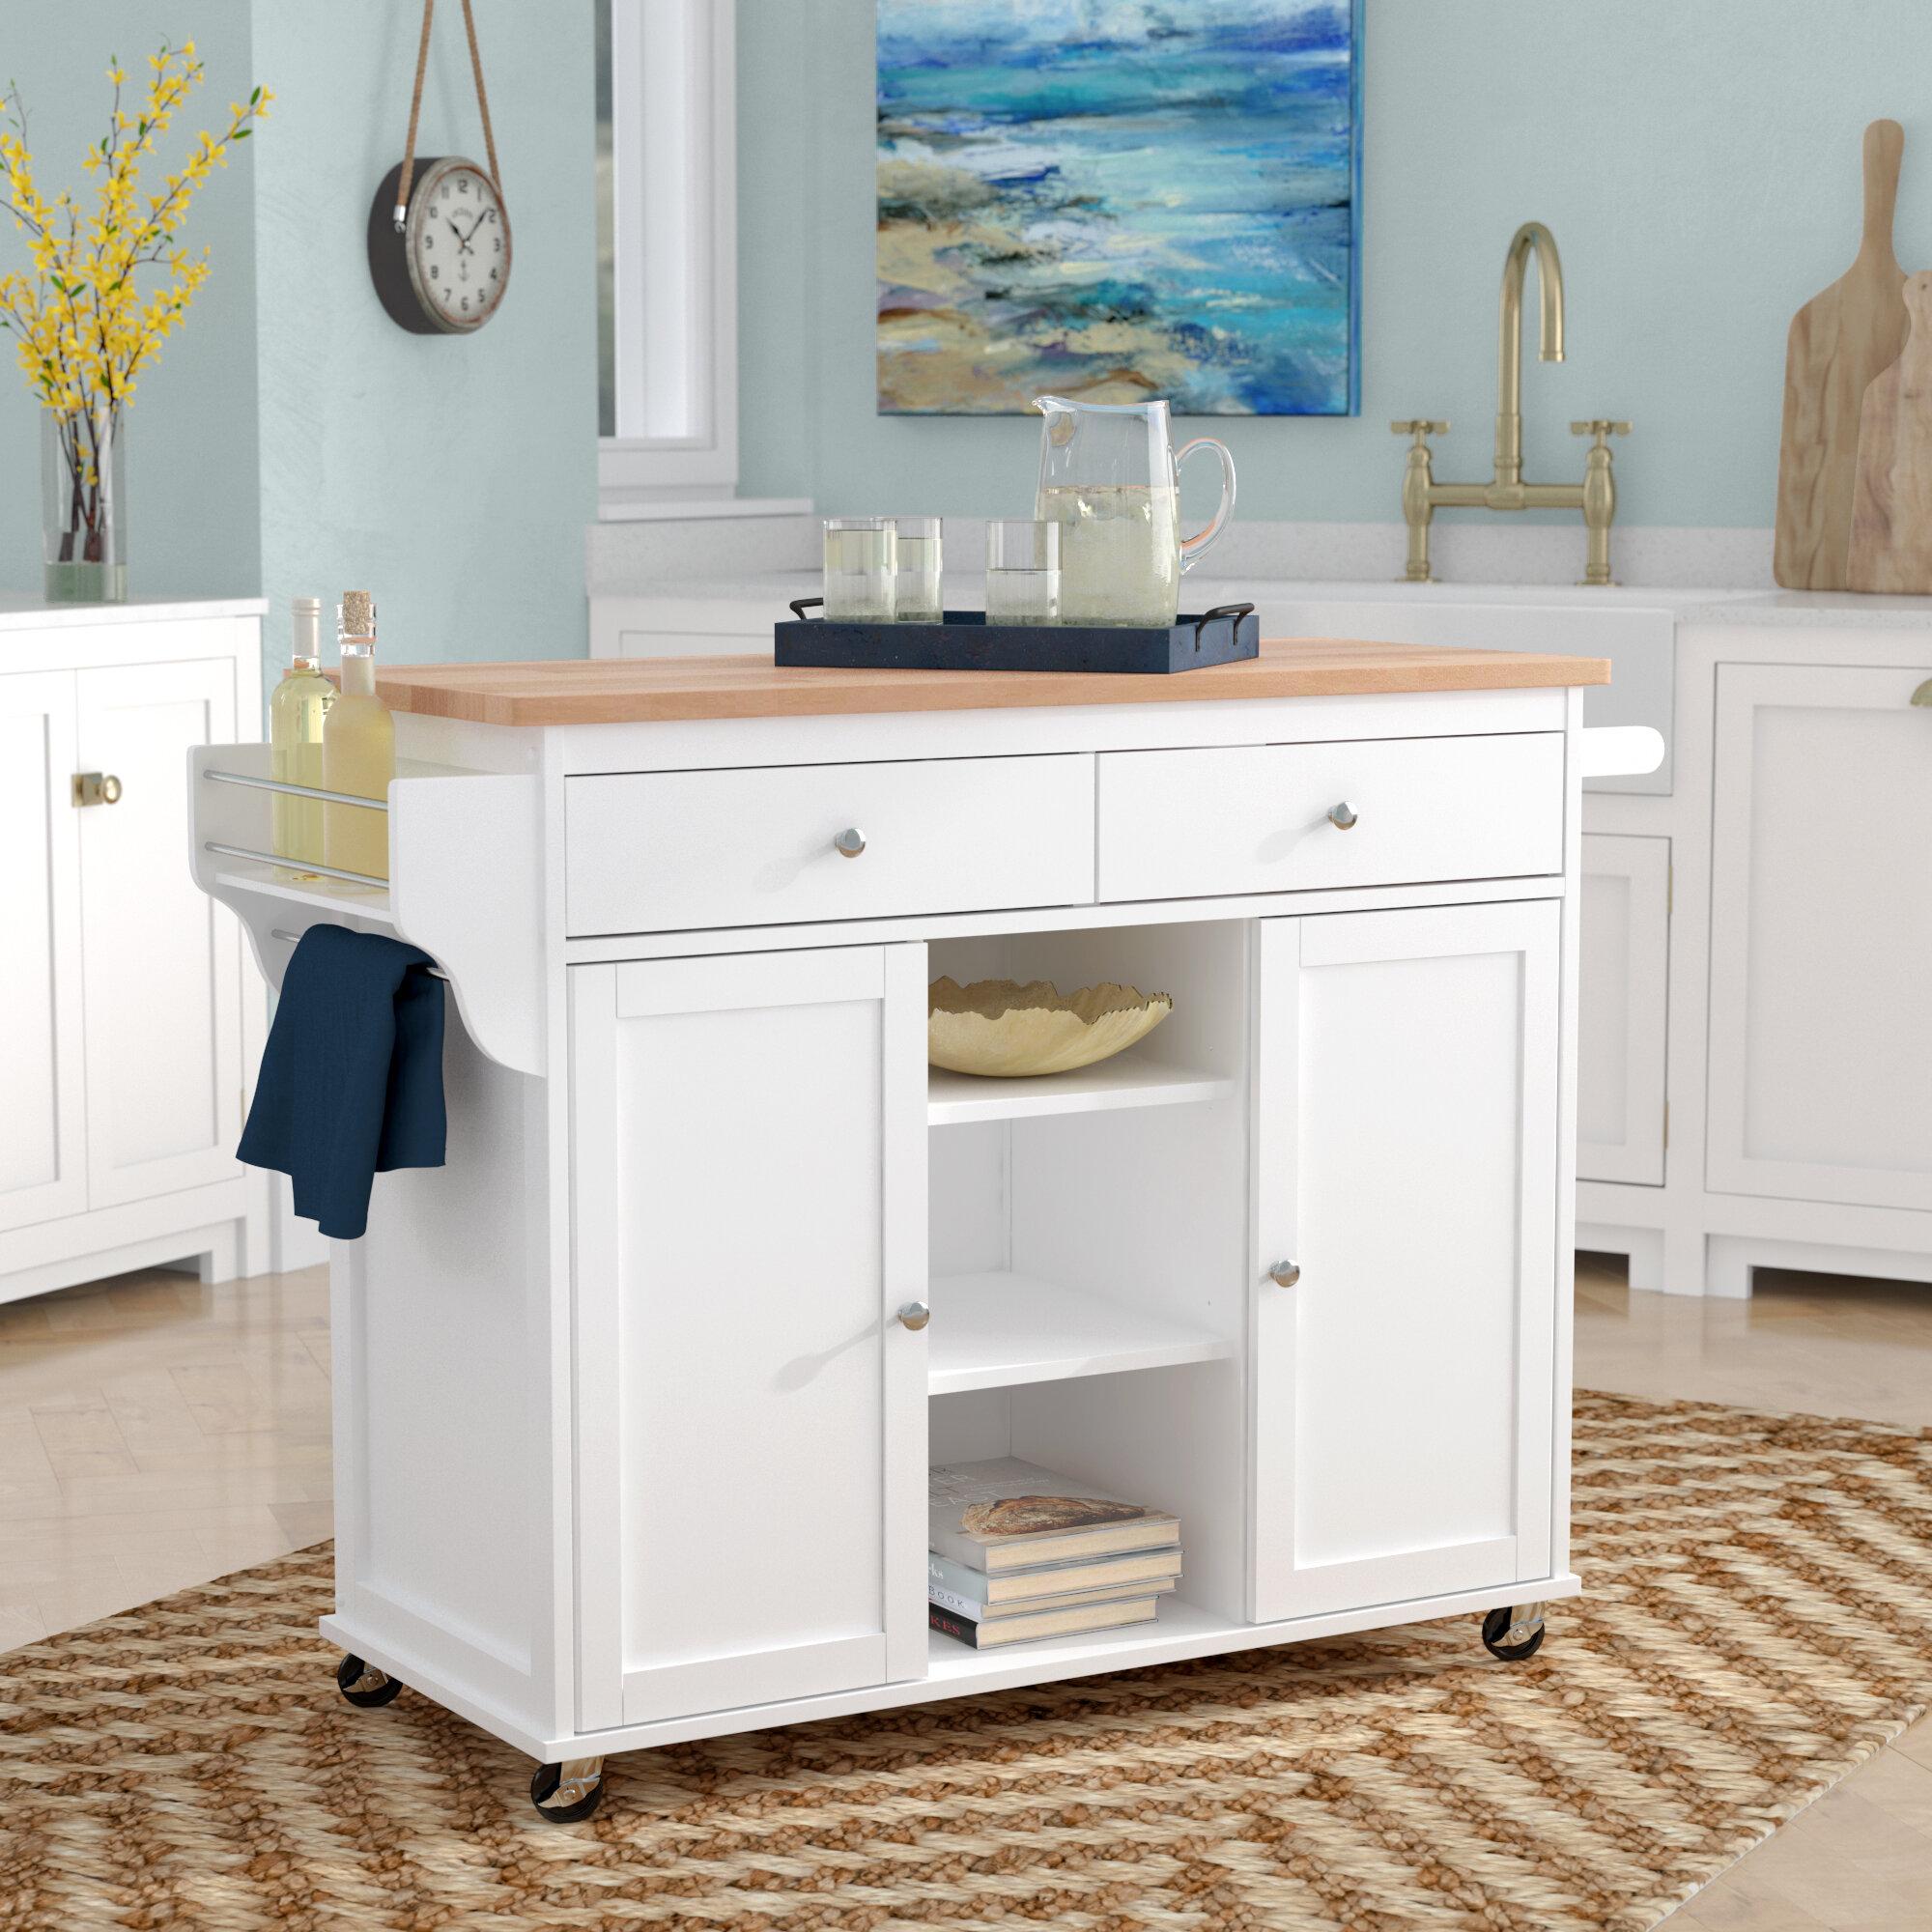 Beachcrest home wilson modern kitchen island with wood top reviews wayfair